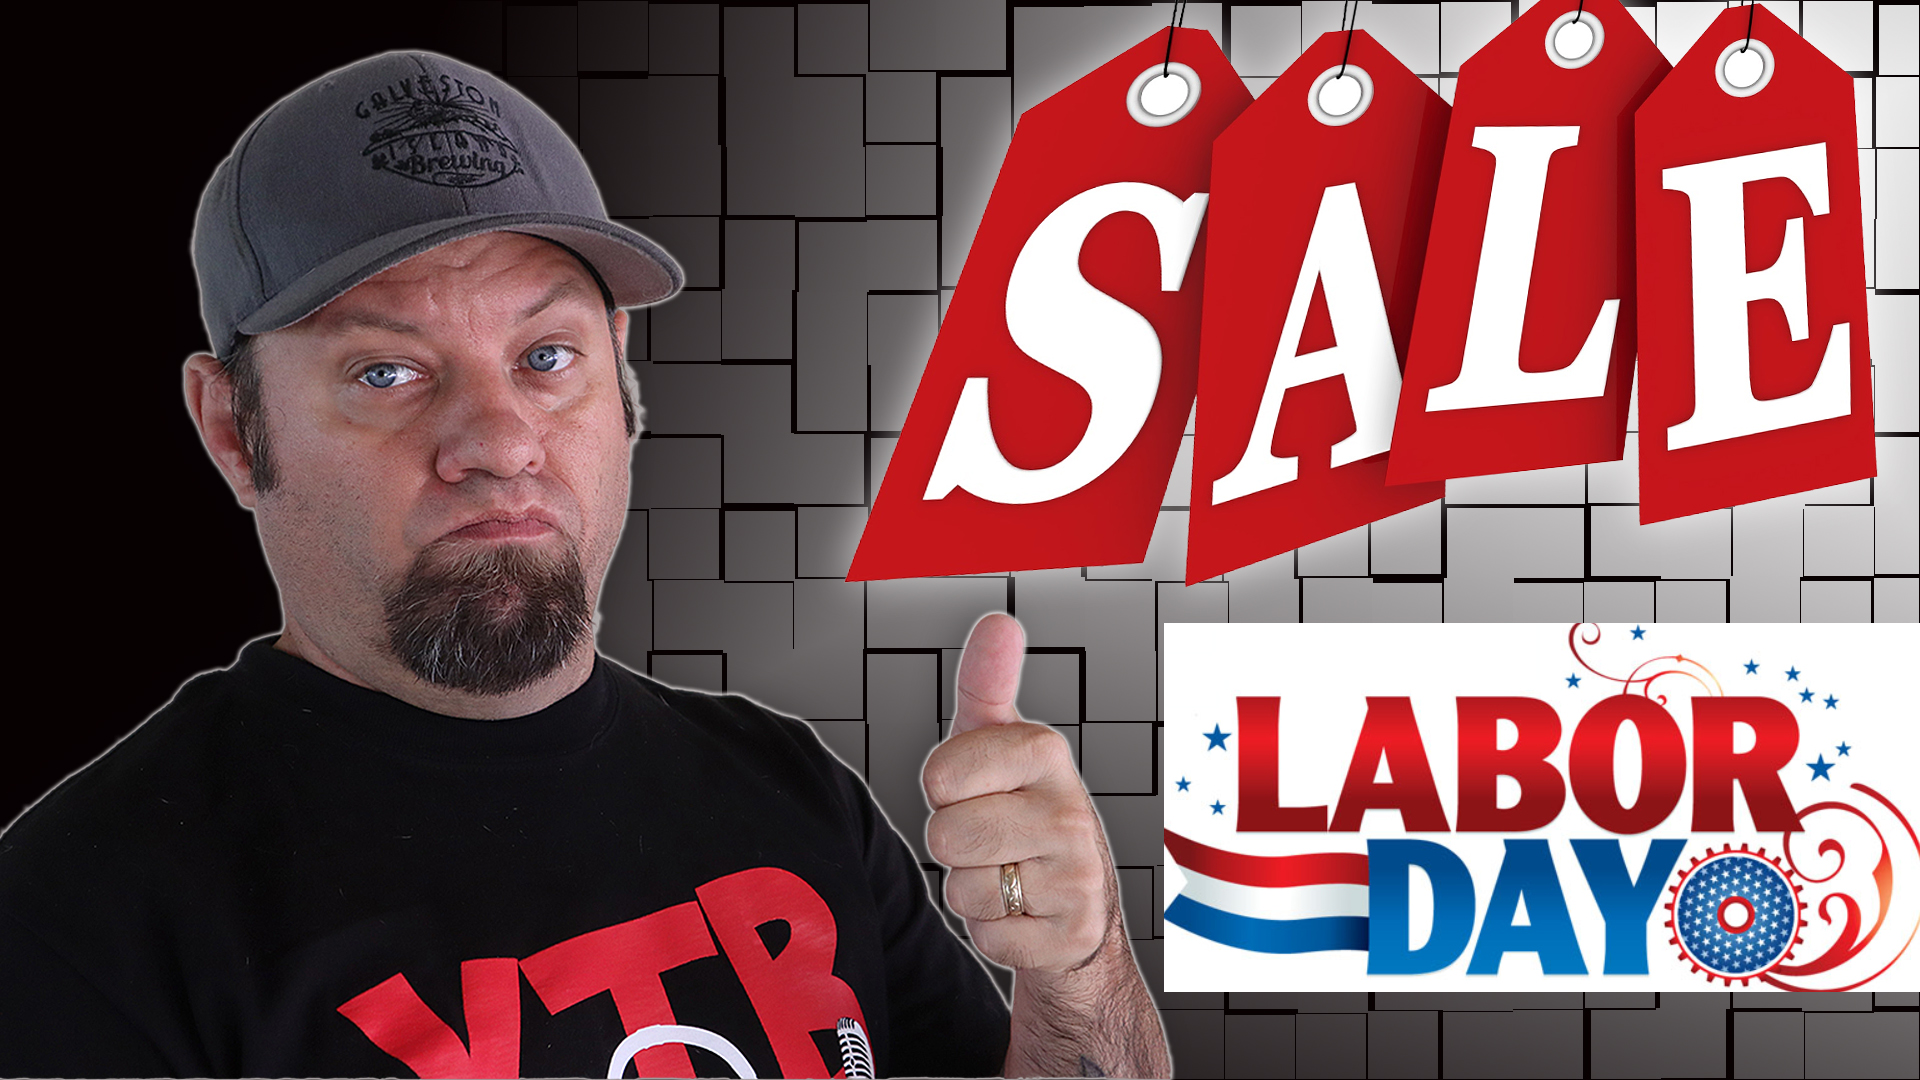 Episode 448: Ham Radio Shopping Deals for Labor Day 2020